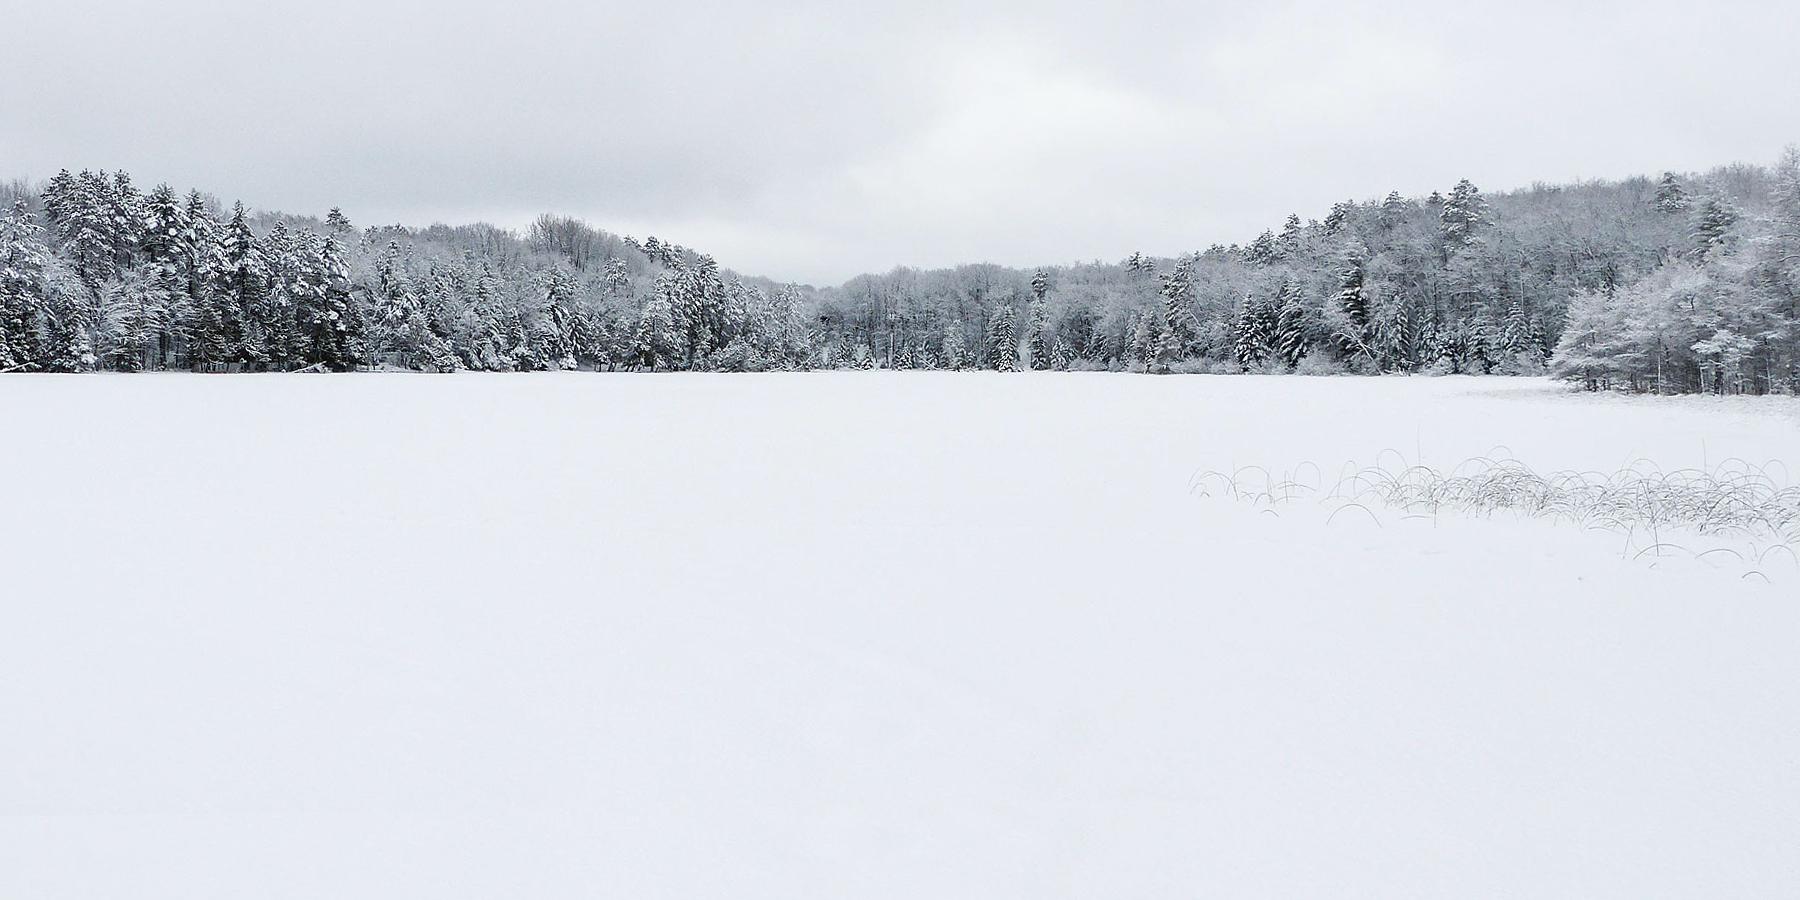 Aerial view of a frozen Shear Lake at Camp Barakel